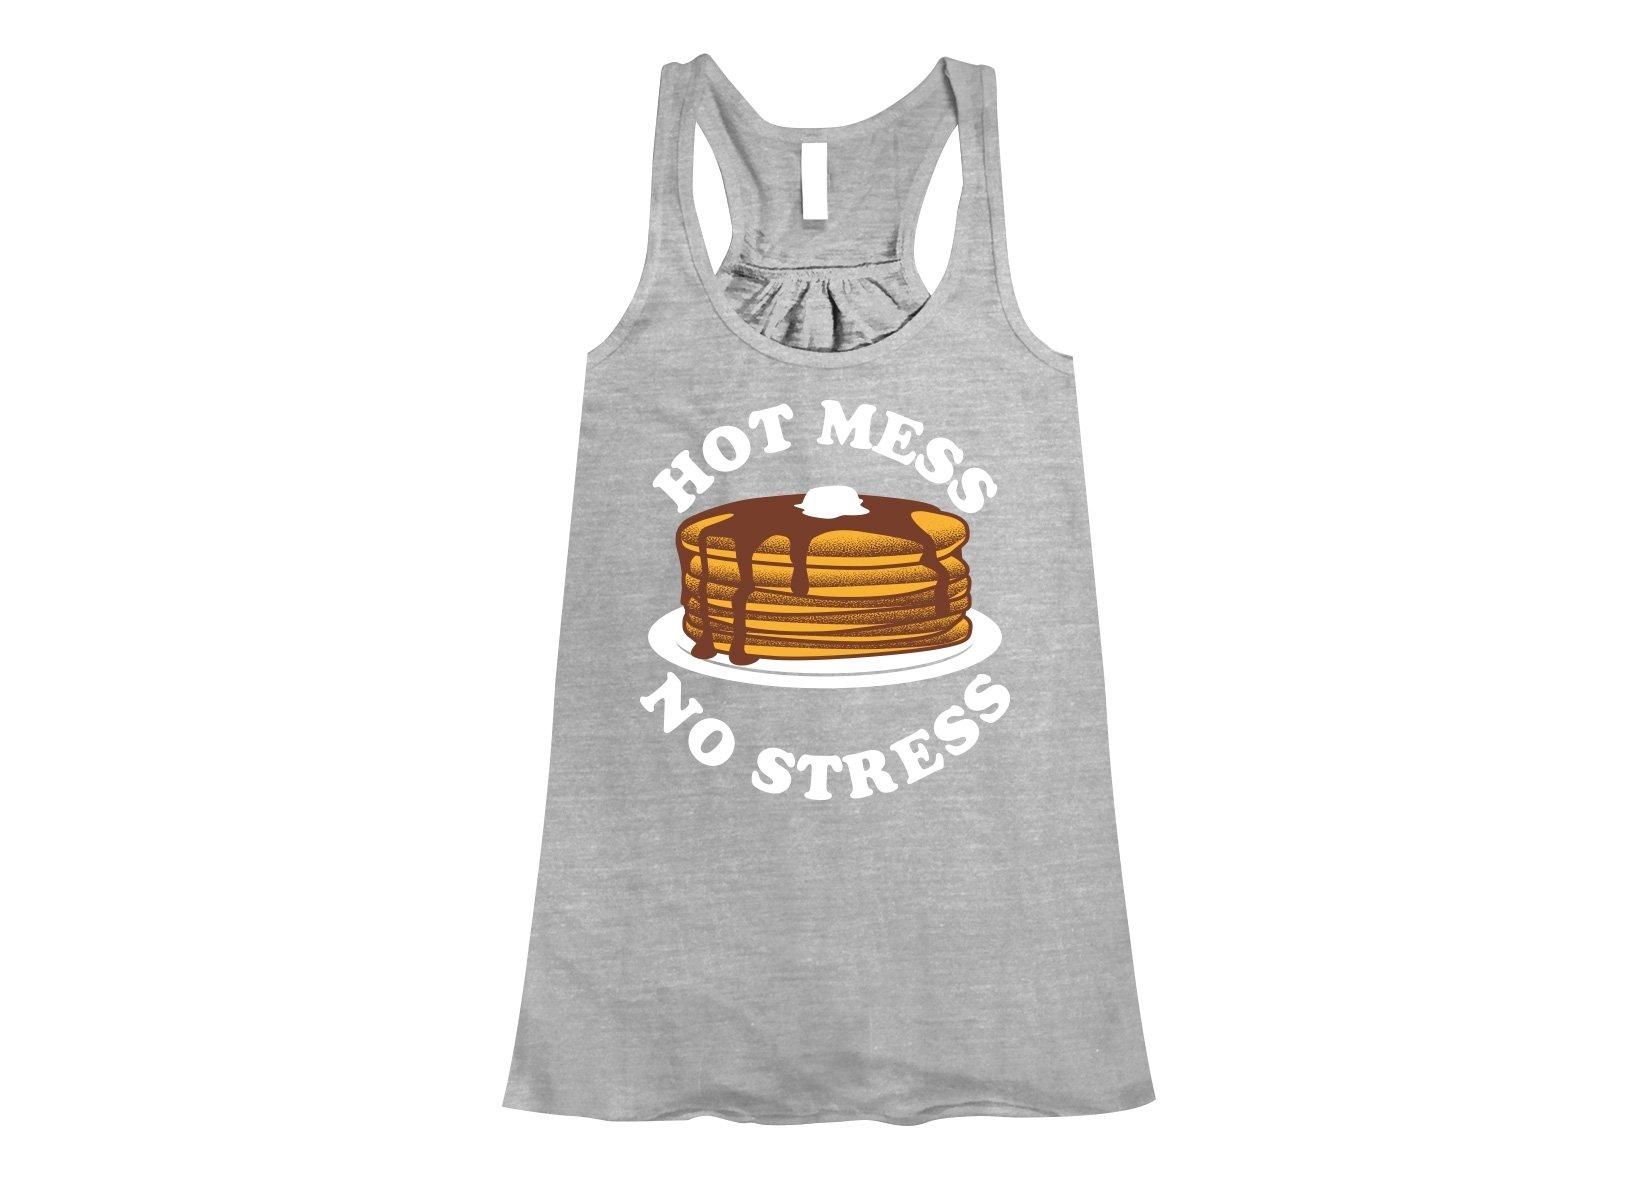 Hot Mess No Stress on Womens Tanks T-Shirt